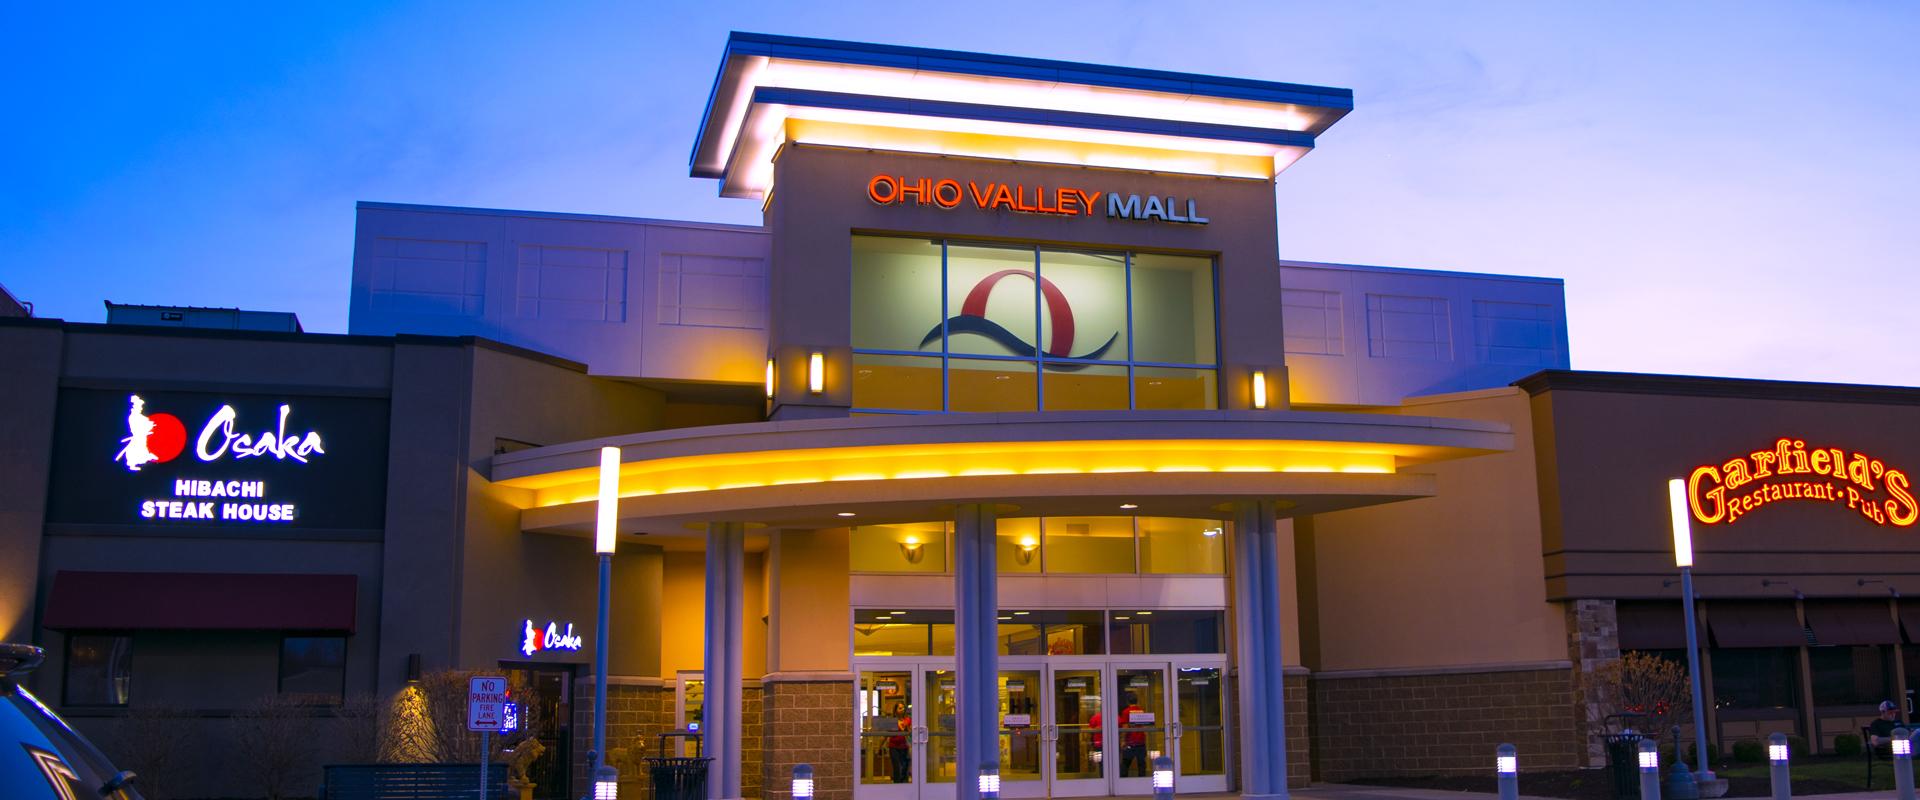 Bitcoin ATM inside Ohio Valley Mall